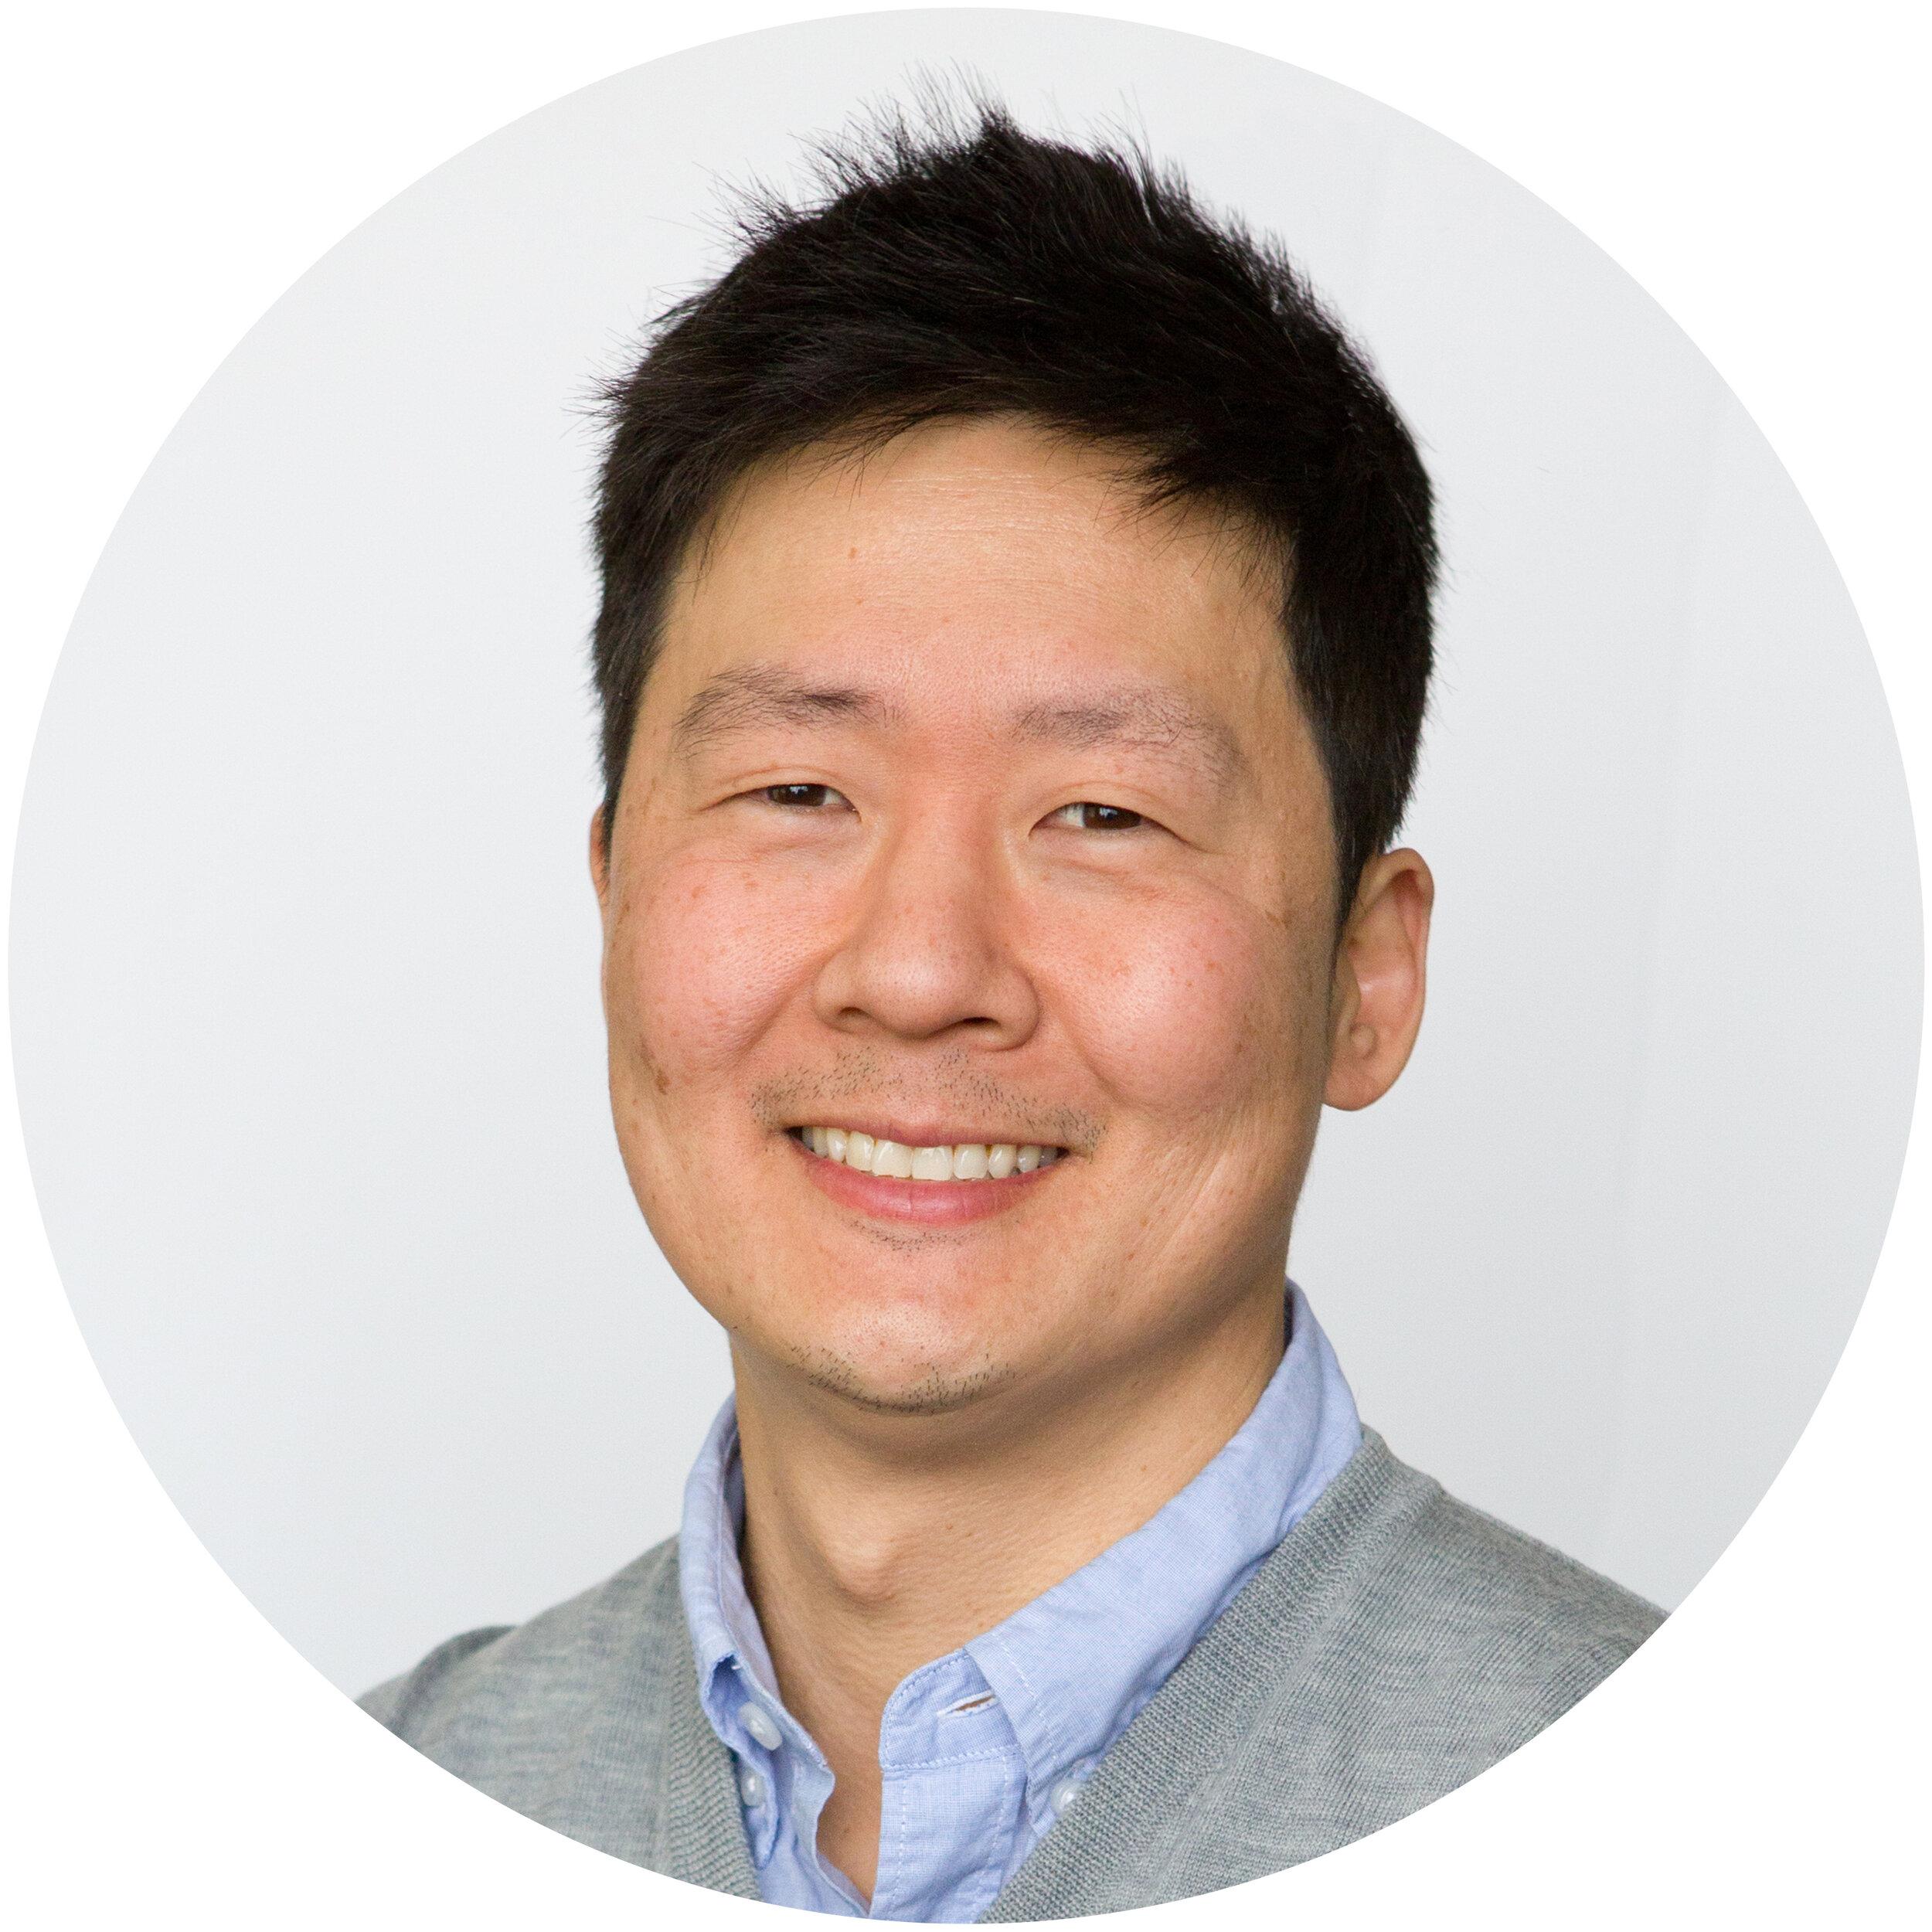 Albert Chung, Ph.D., P.E., Senior Project Manager, Air, Climate Change & GHG, KERAMIDA Inc.